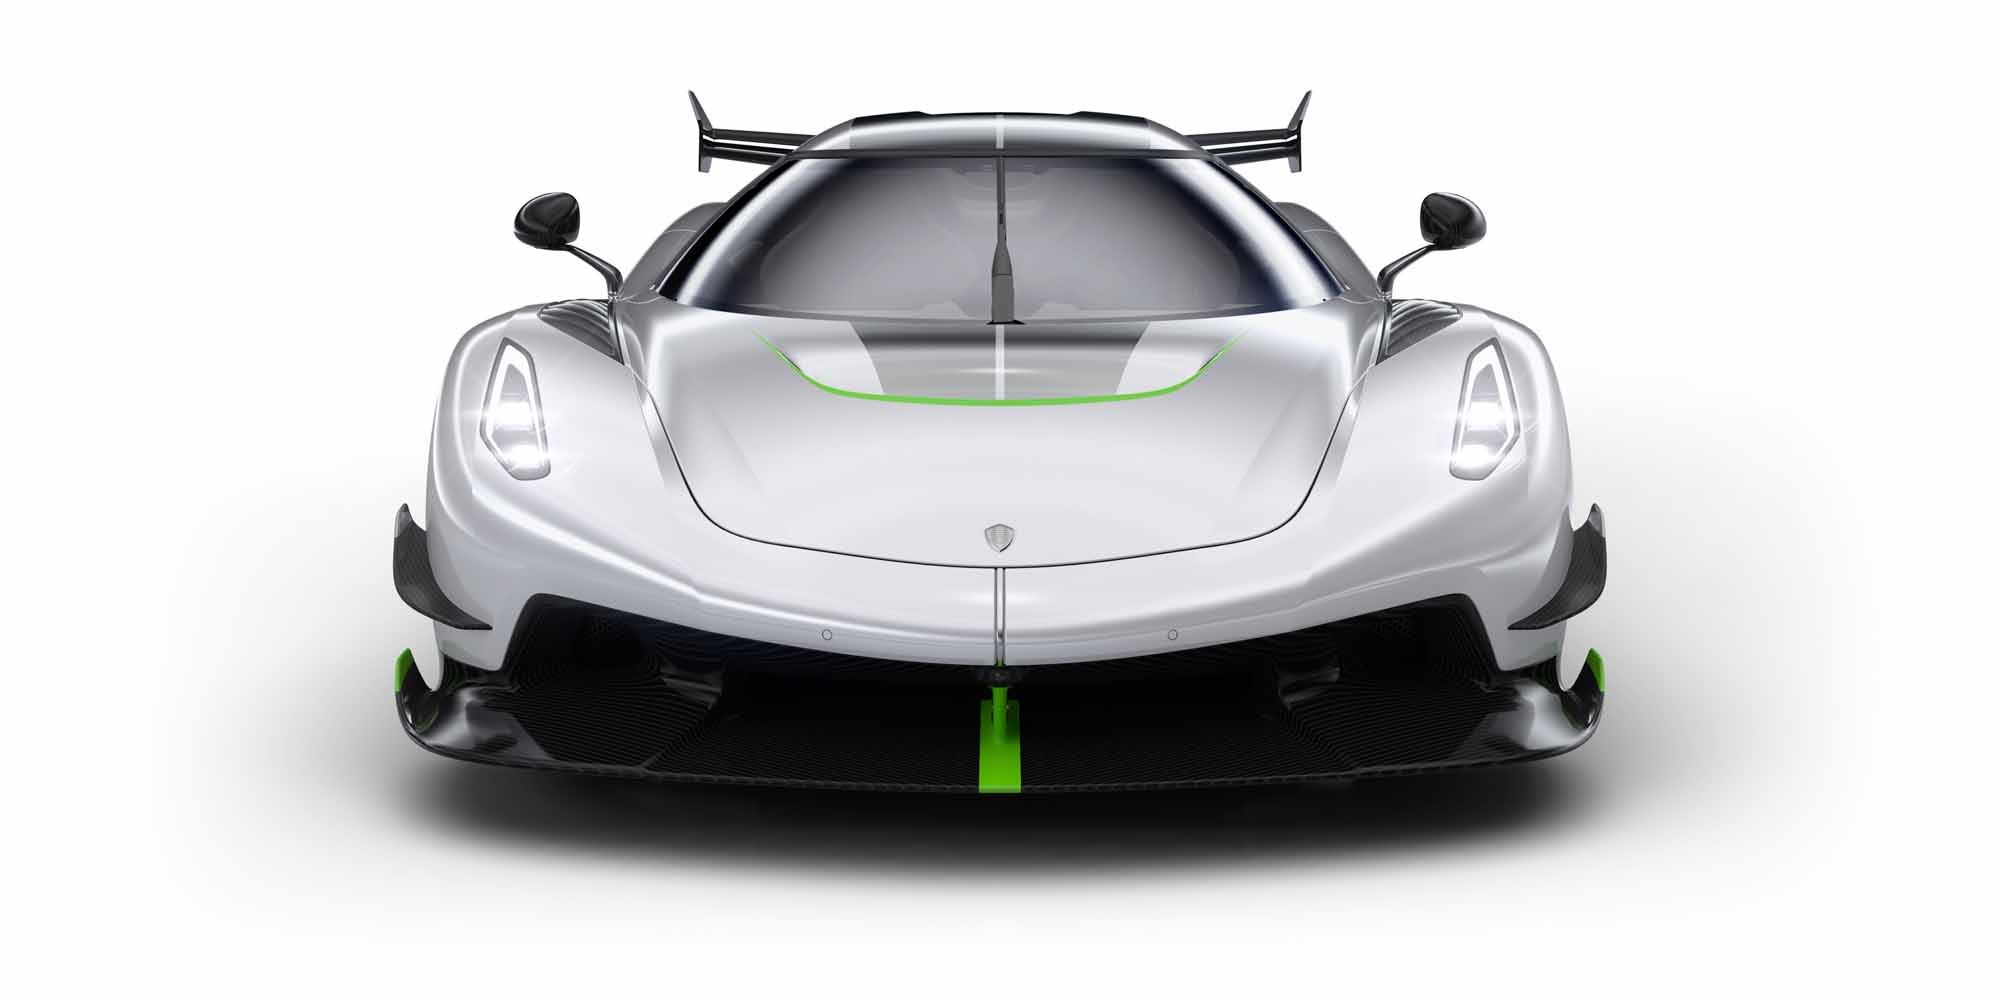 C:\Users\Jialing\Desktop\20190403\20190403\639-Car Guide\Koenigsegg Jesko - half\5c80b363ec05c47562000043.jpg